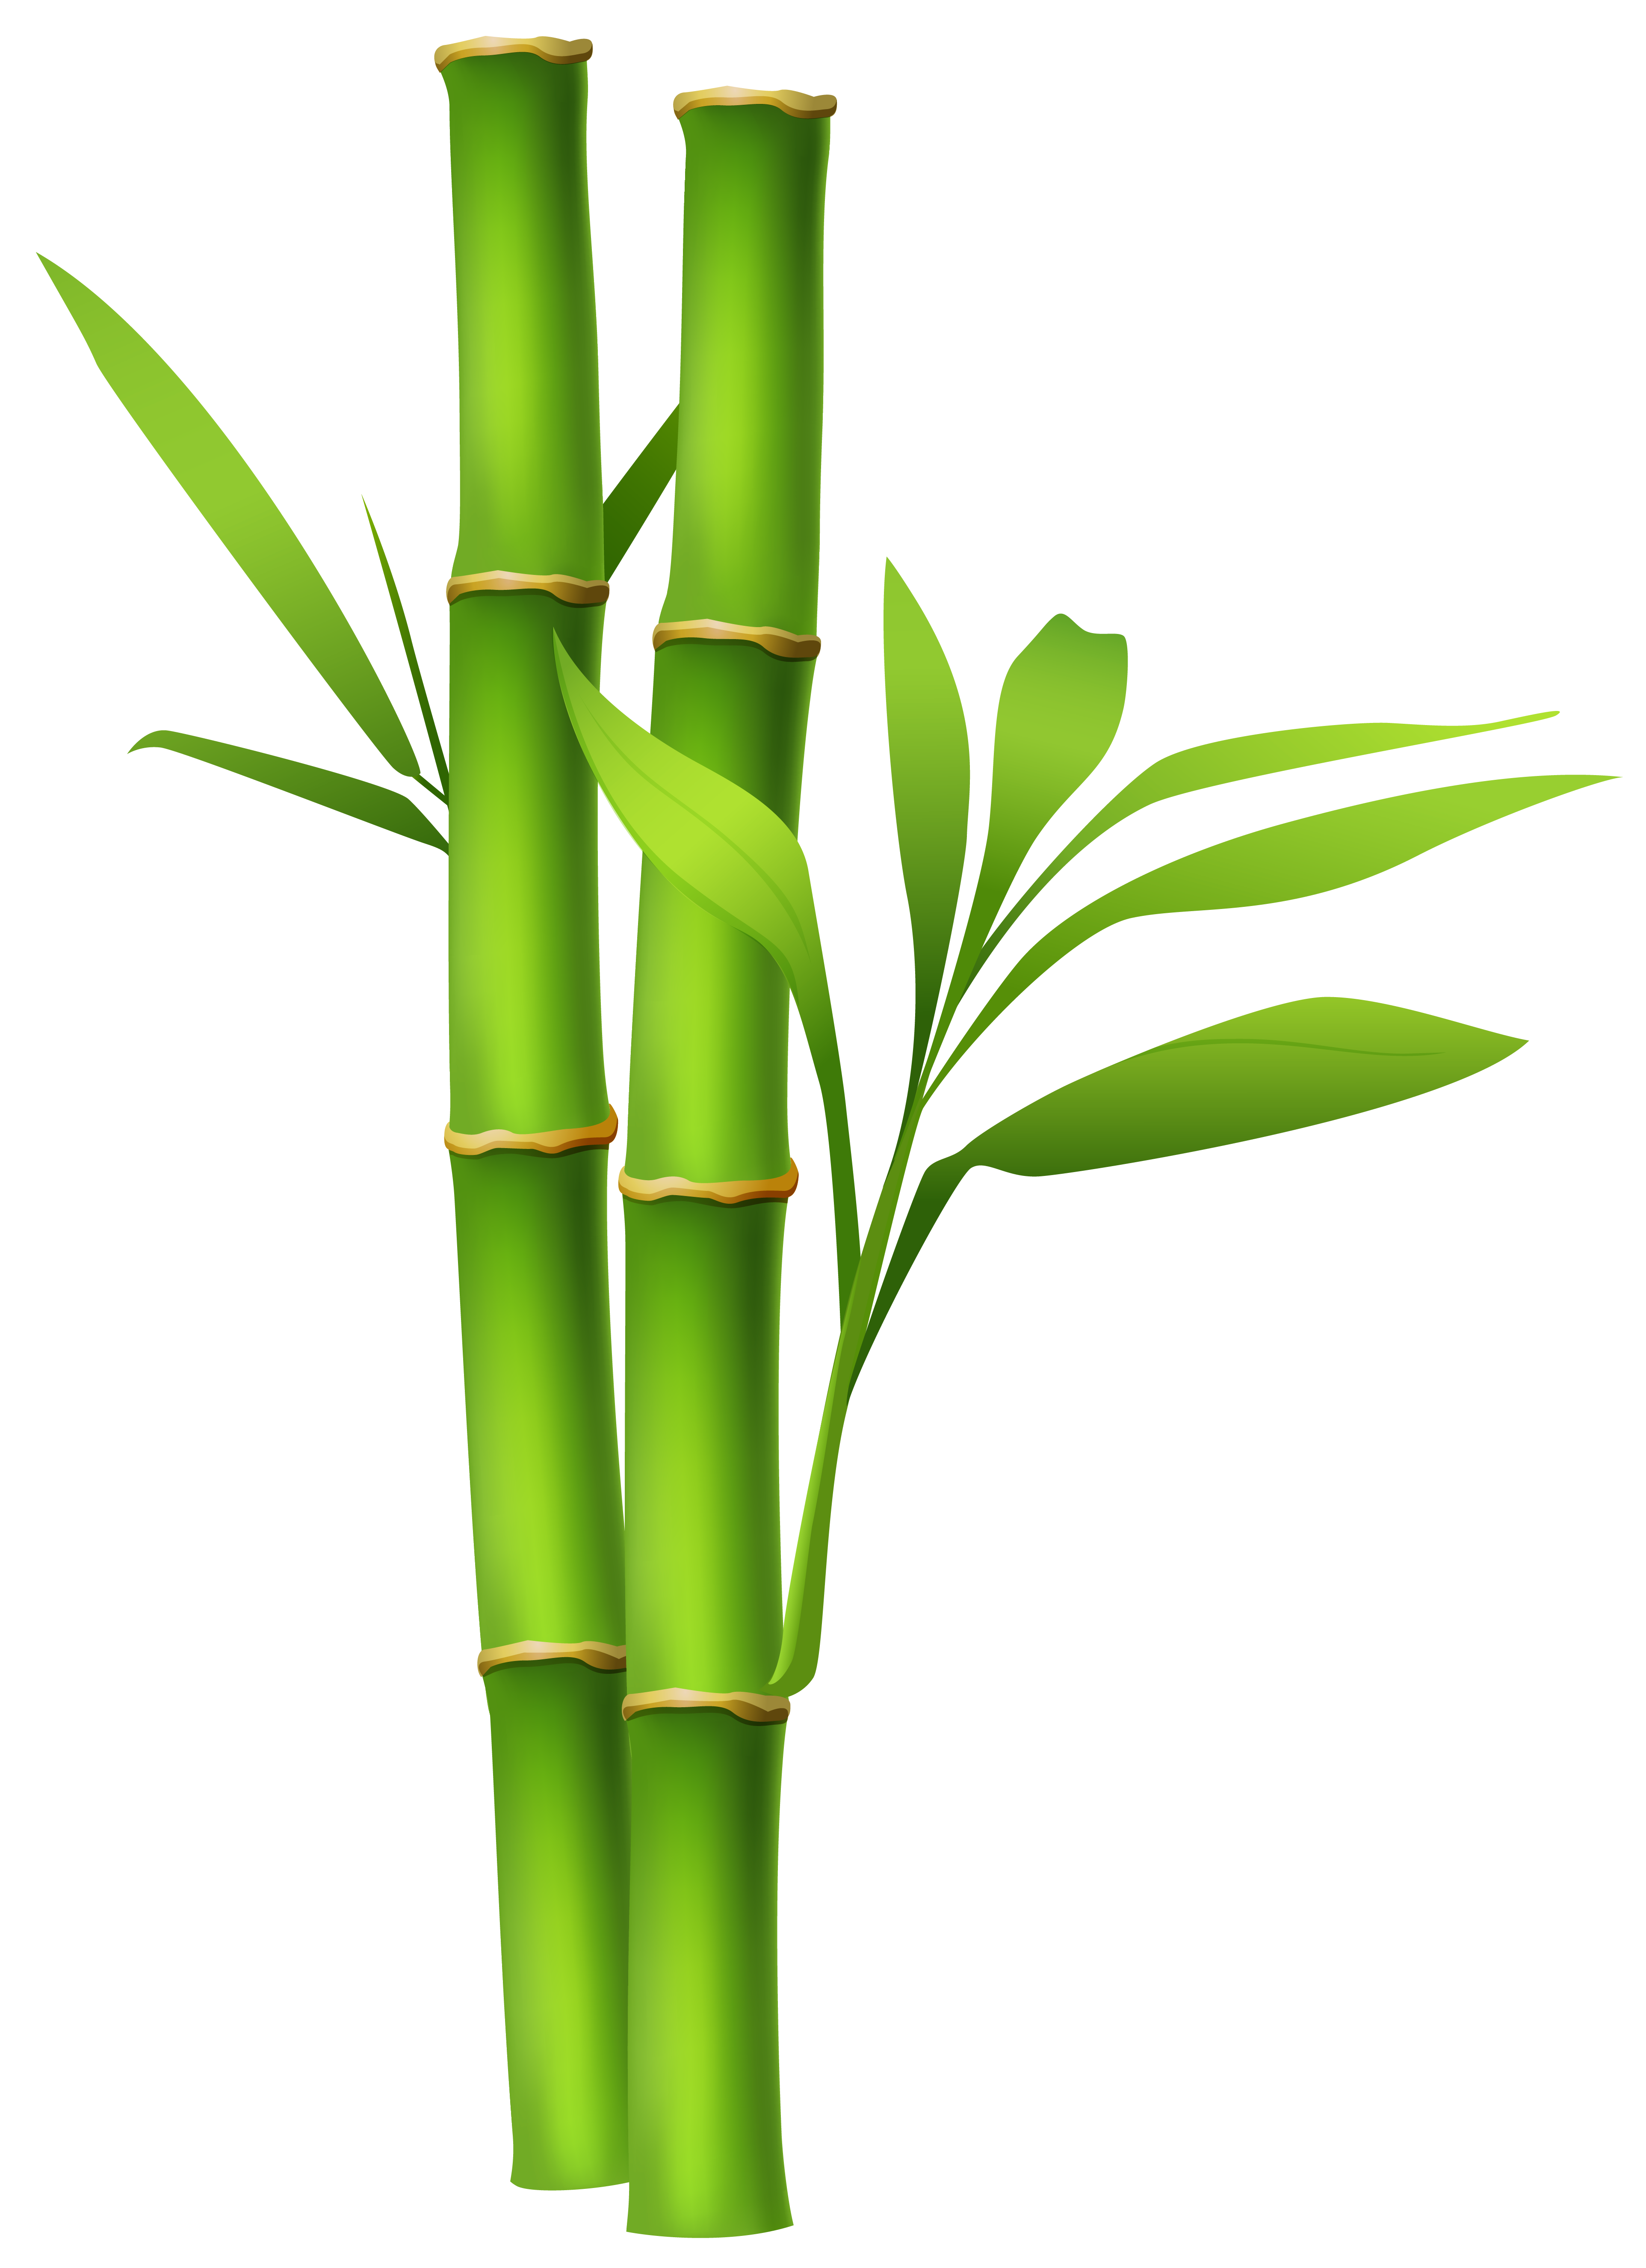 3849x5302 Bamboo Png Imageu200b Gallery Yopriceville